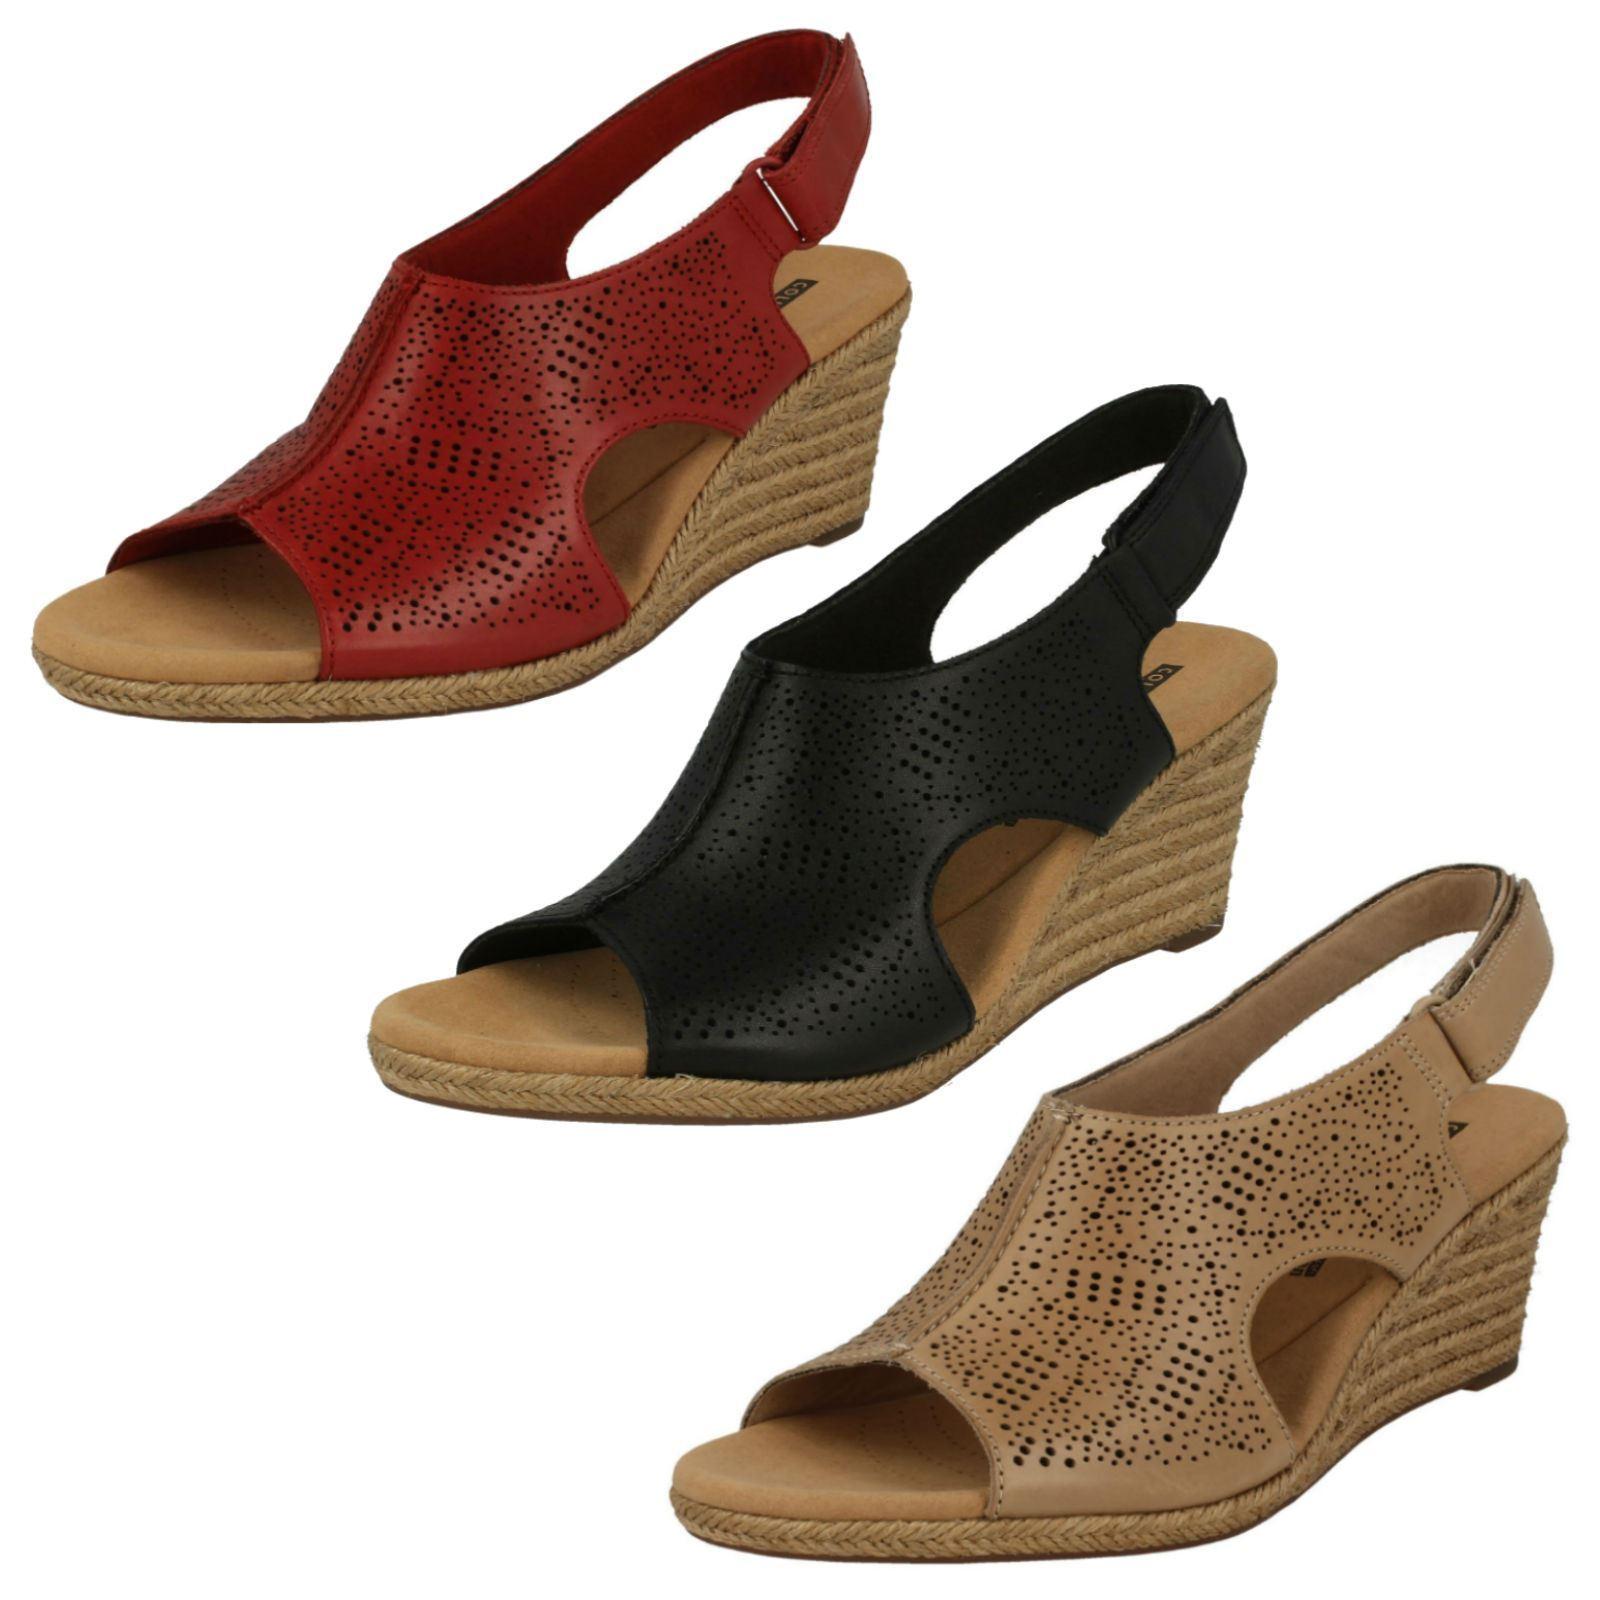 Ladies Wedge Clarks Lafley Rosen Leather Smart Wedge Ladies Heeled Sandals D Fitting f860d2